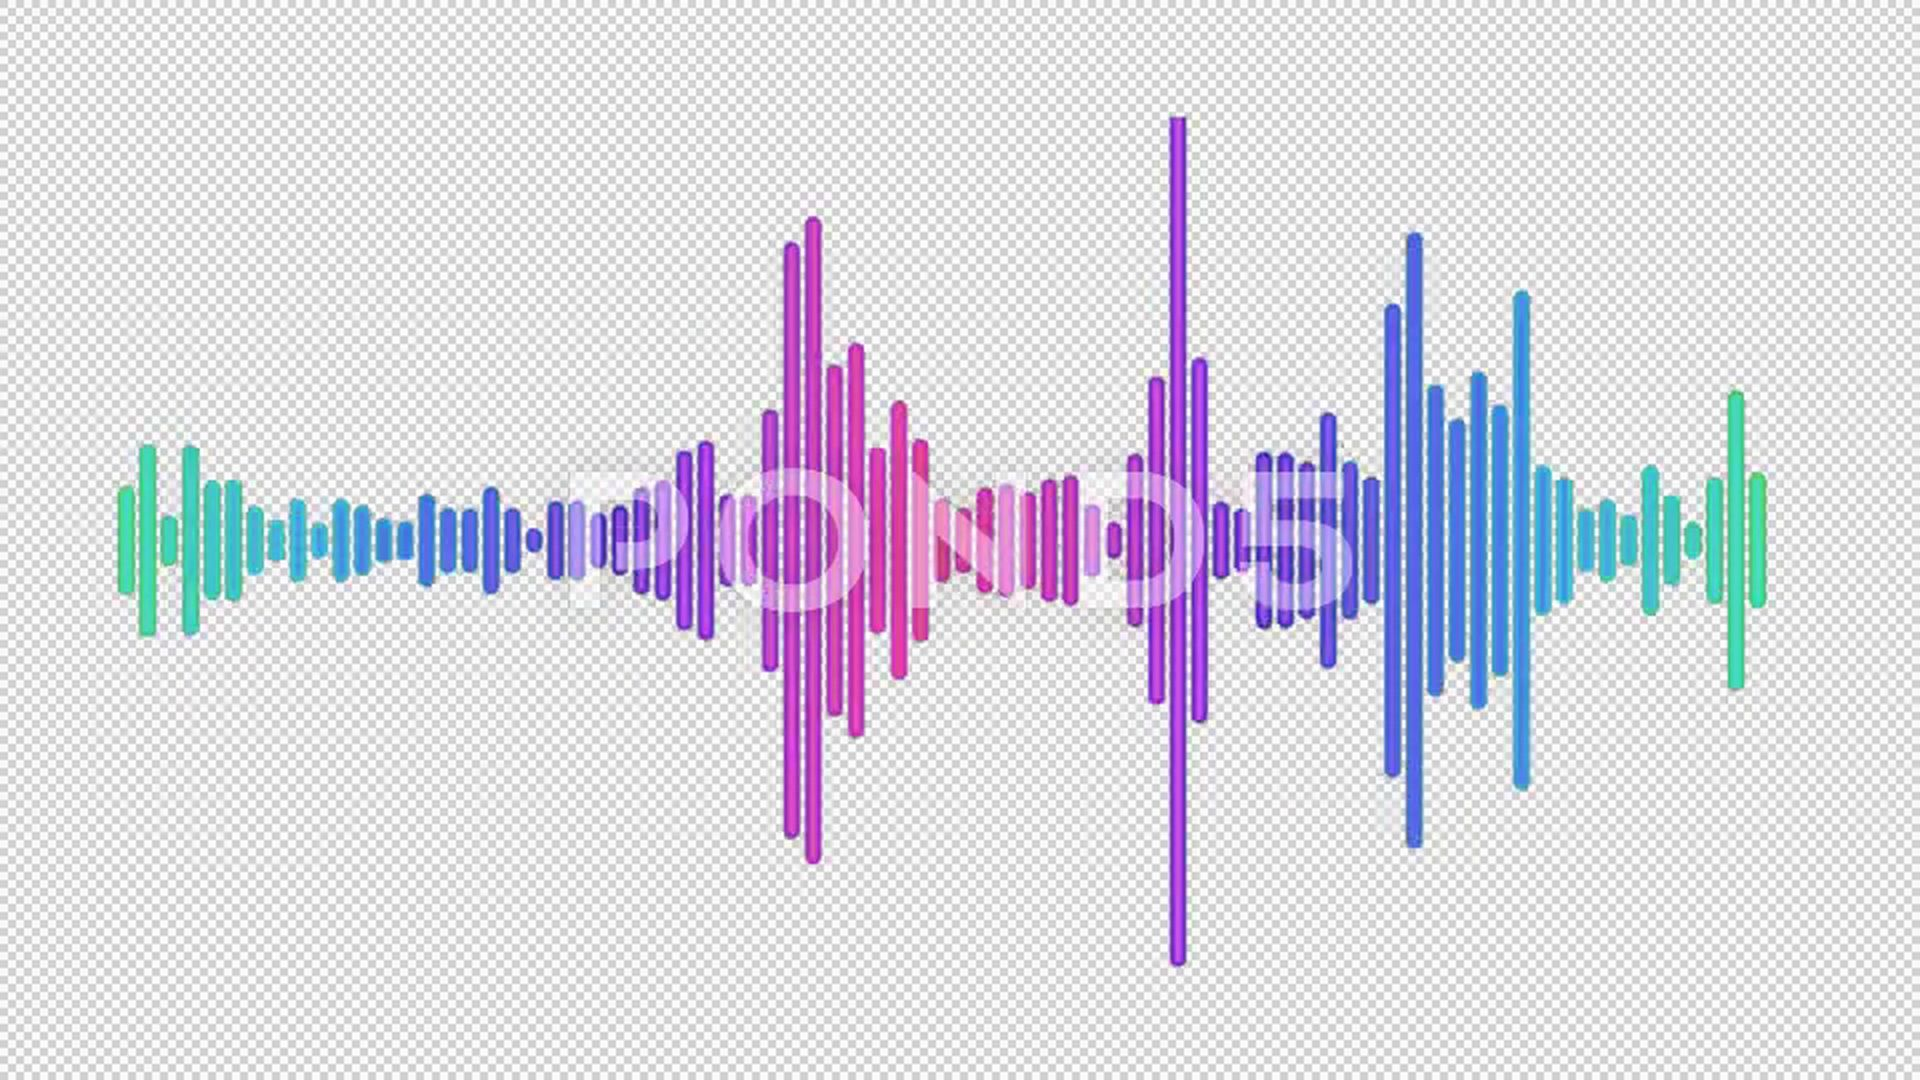 Audio Spectrum Line Waveform Animation On Alpha Channel Background Stock Footage Waveform Animation Line Audio Audio Alpha Channel Animation